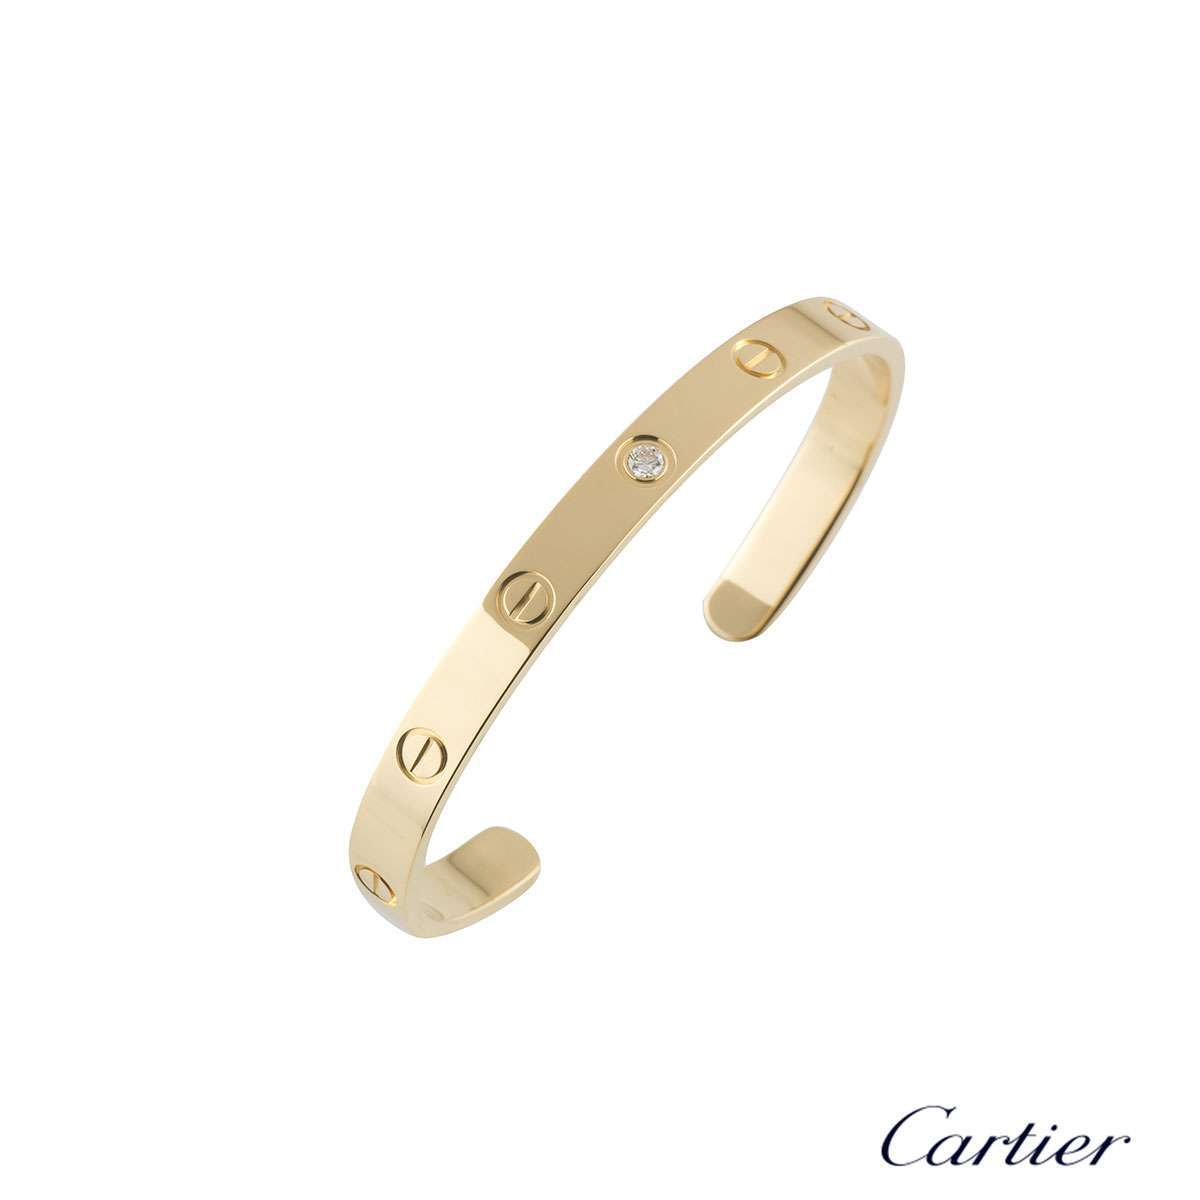 Cartier Love Cuff Diamond Bracelet Size 16 B6029816